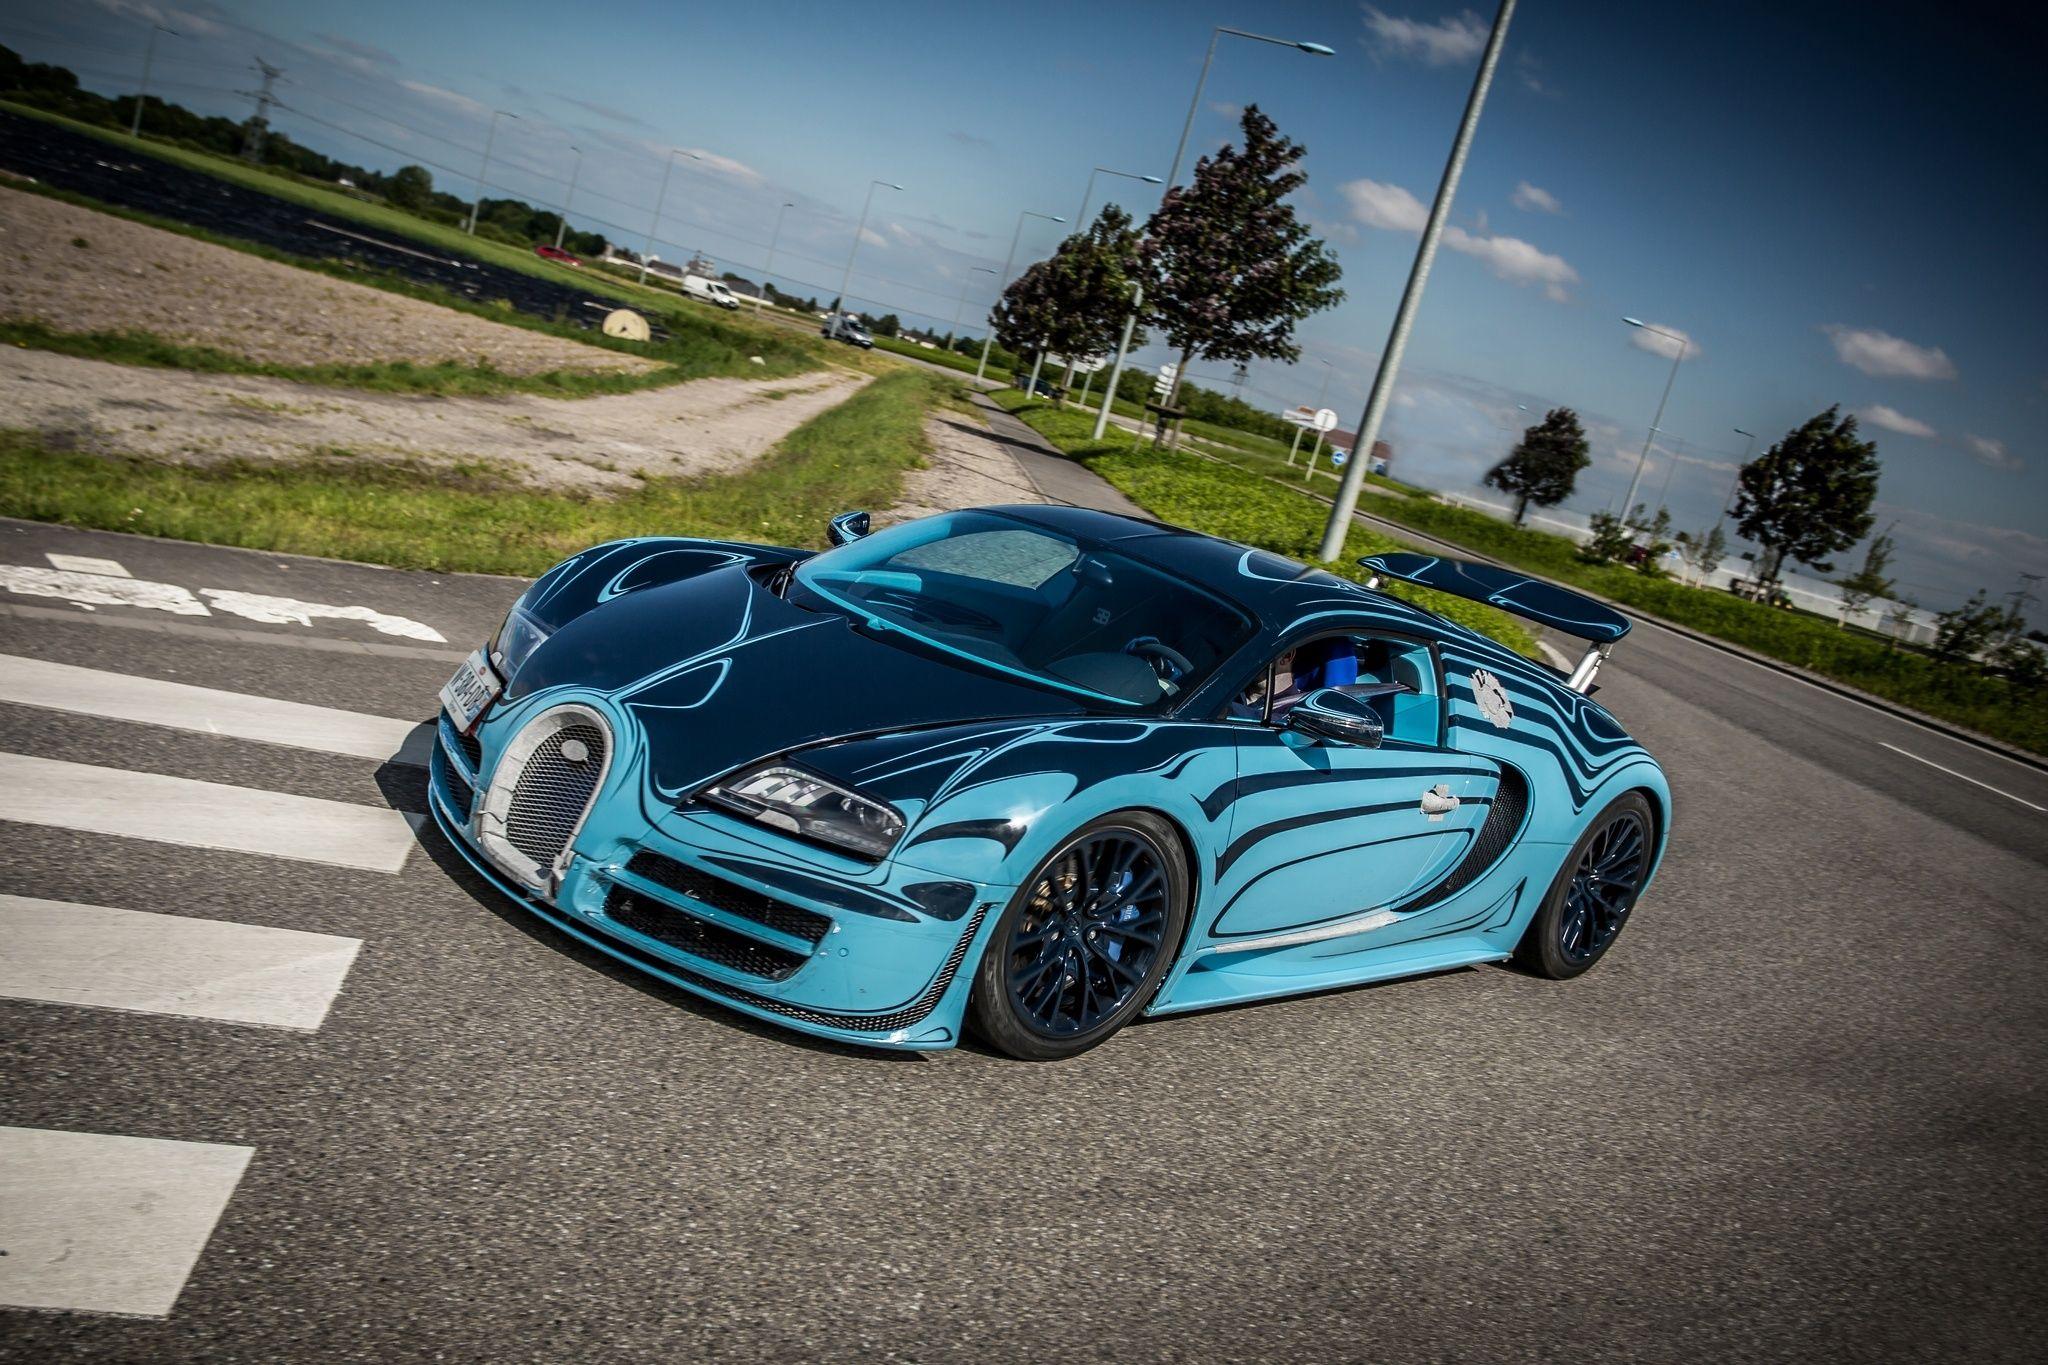 7fd4bcbb348fe7fcdf5f29c5a00da73e Stunning Bugatti Veyron Price In Brazil Cars Trend